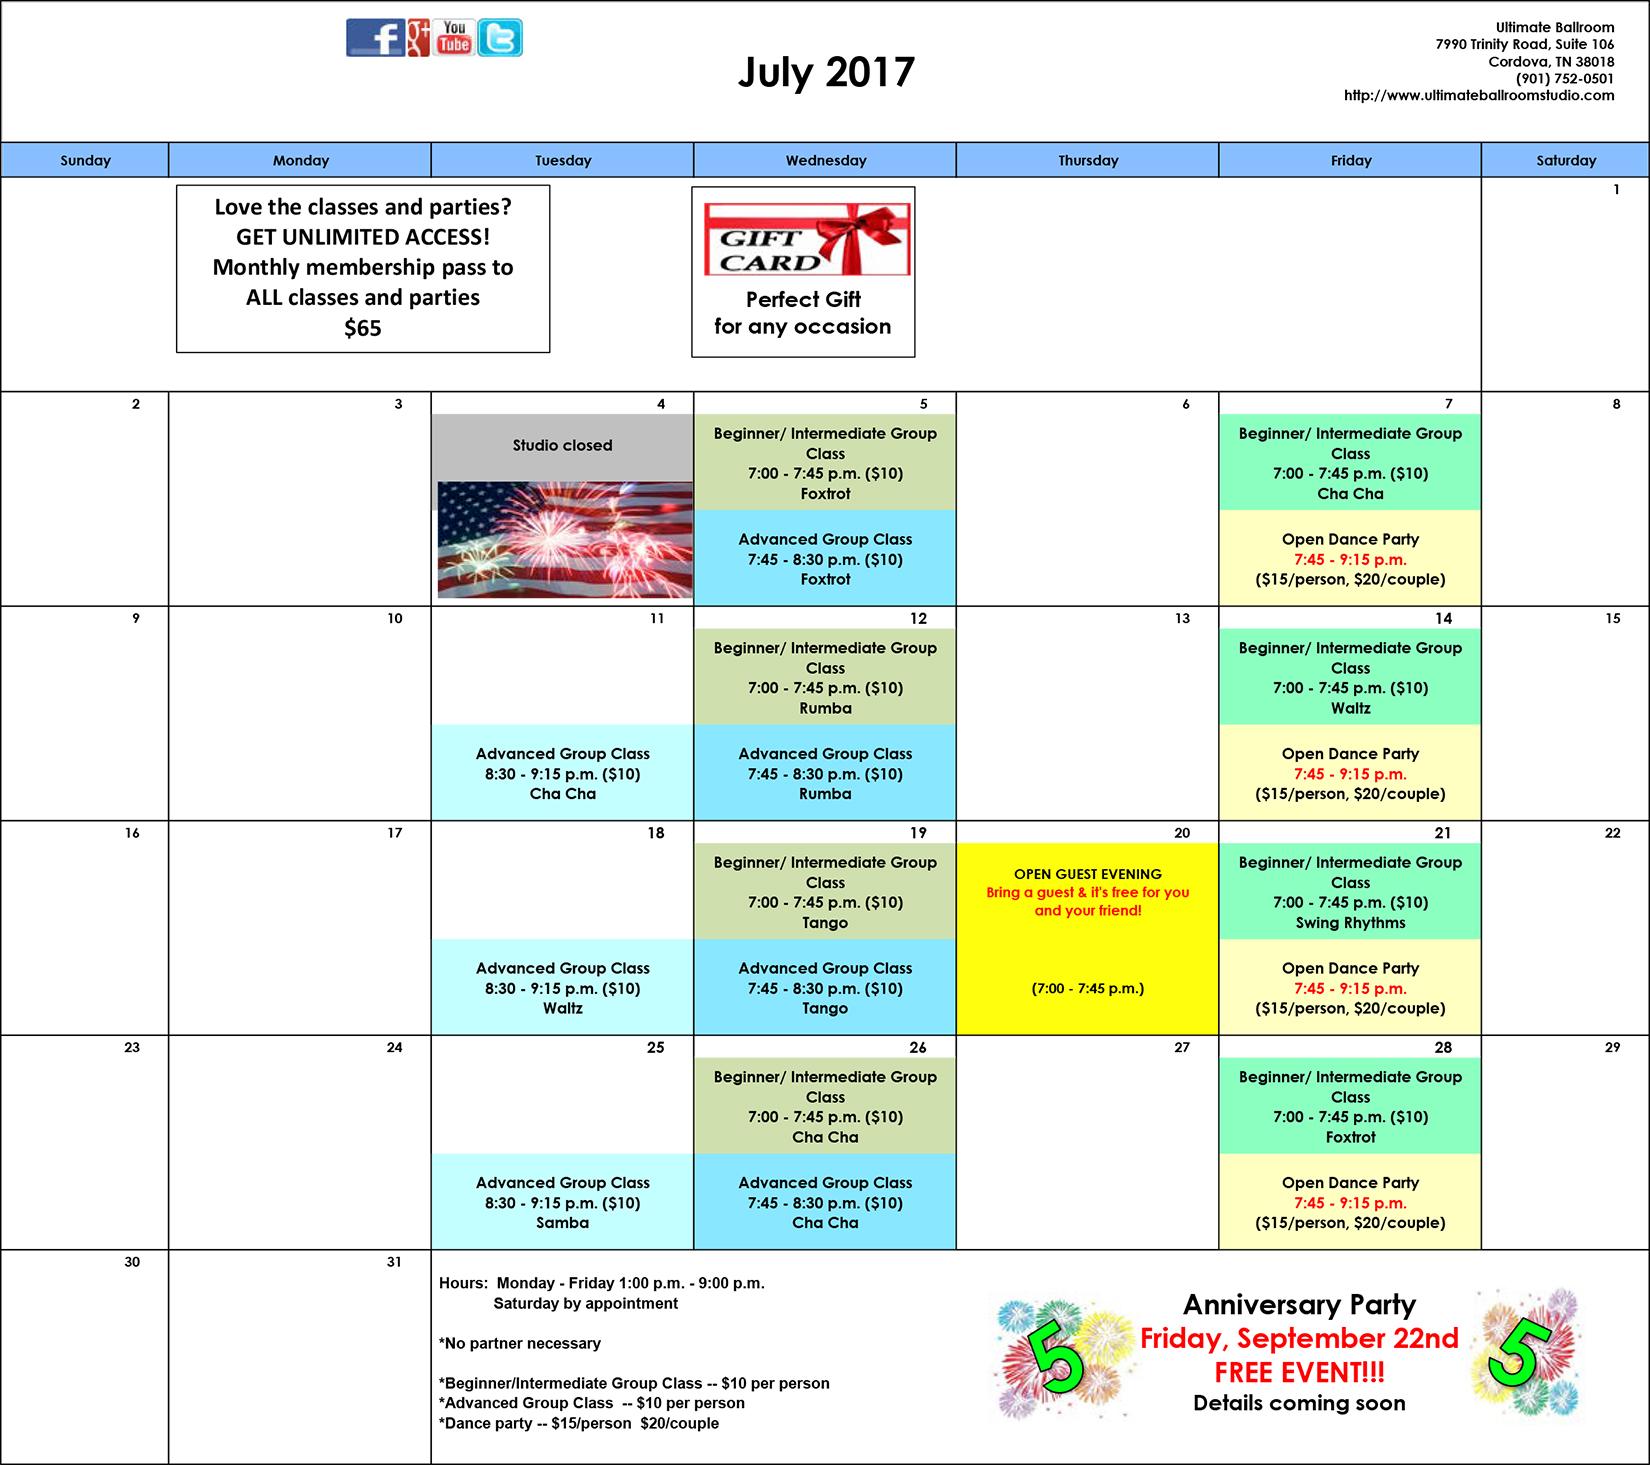 Events Calendar - July 2017 - Ultimate Ballroom